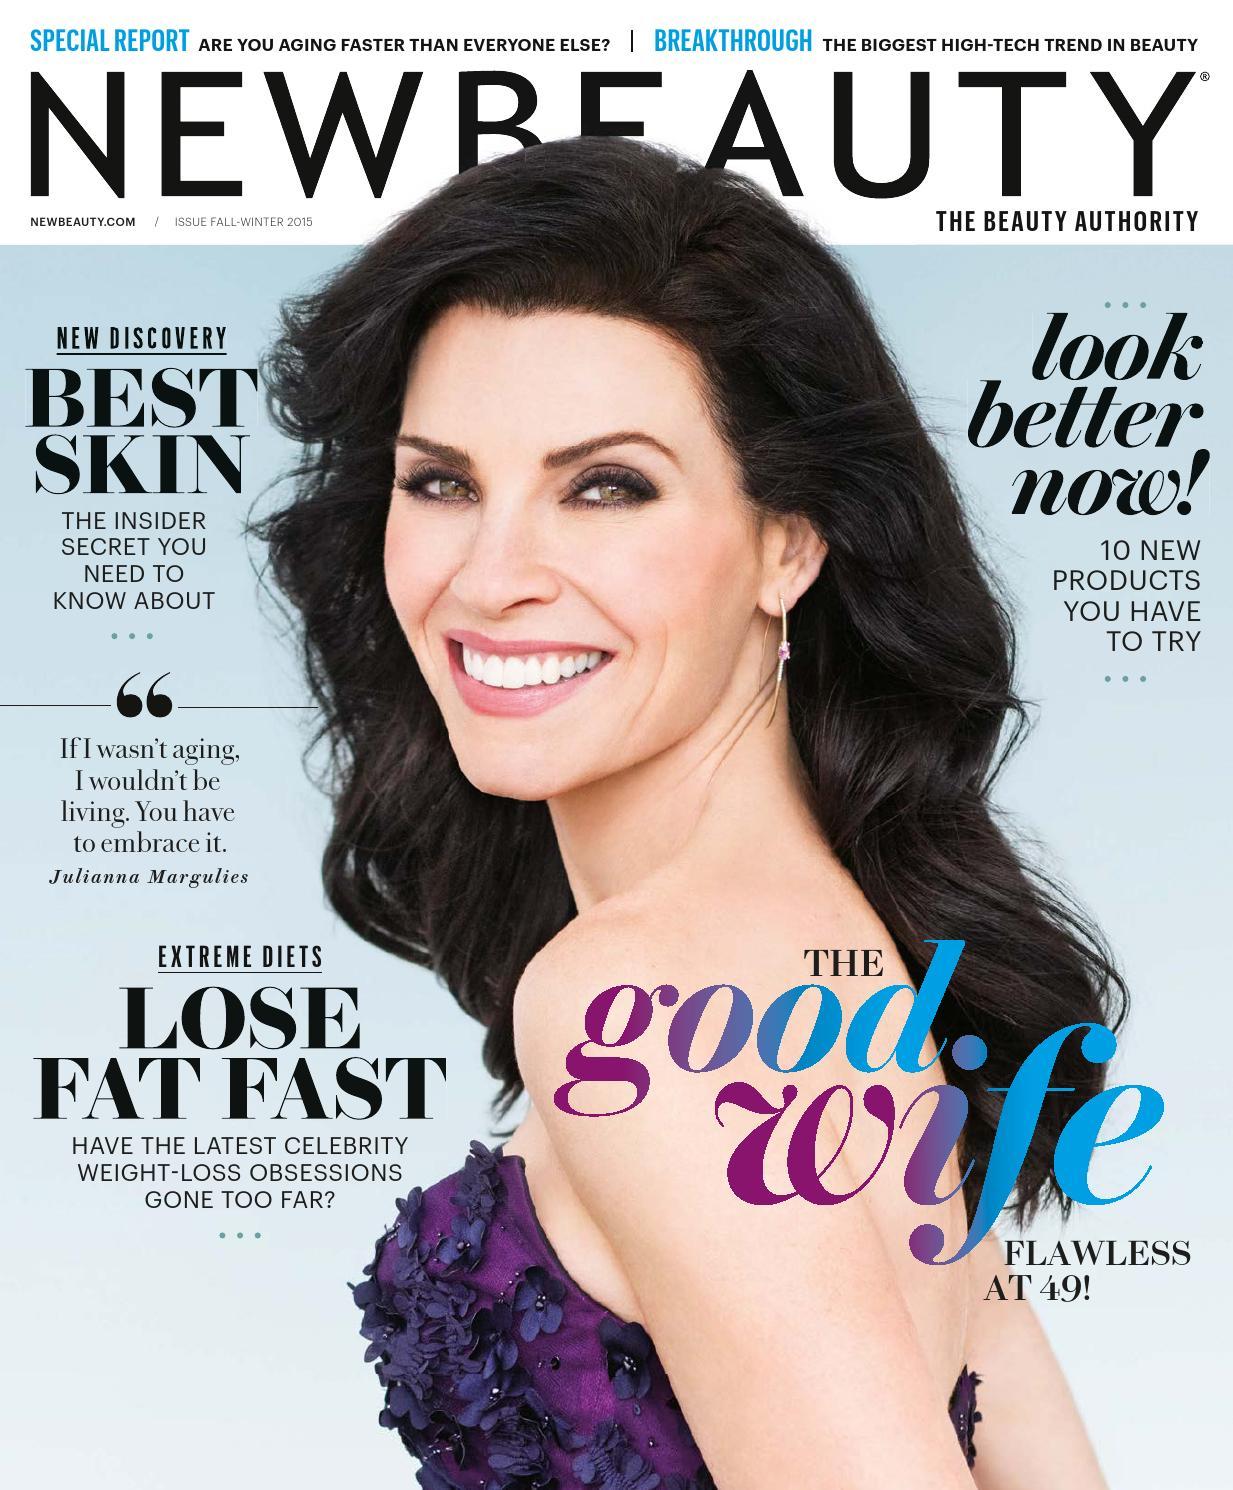 Newbeauty Issue 41 Sw Fall 2015 By Sandow Issuu Anastasia Beverly Hills Illuminators Rivera